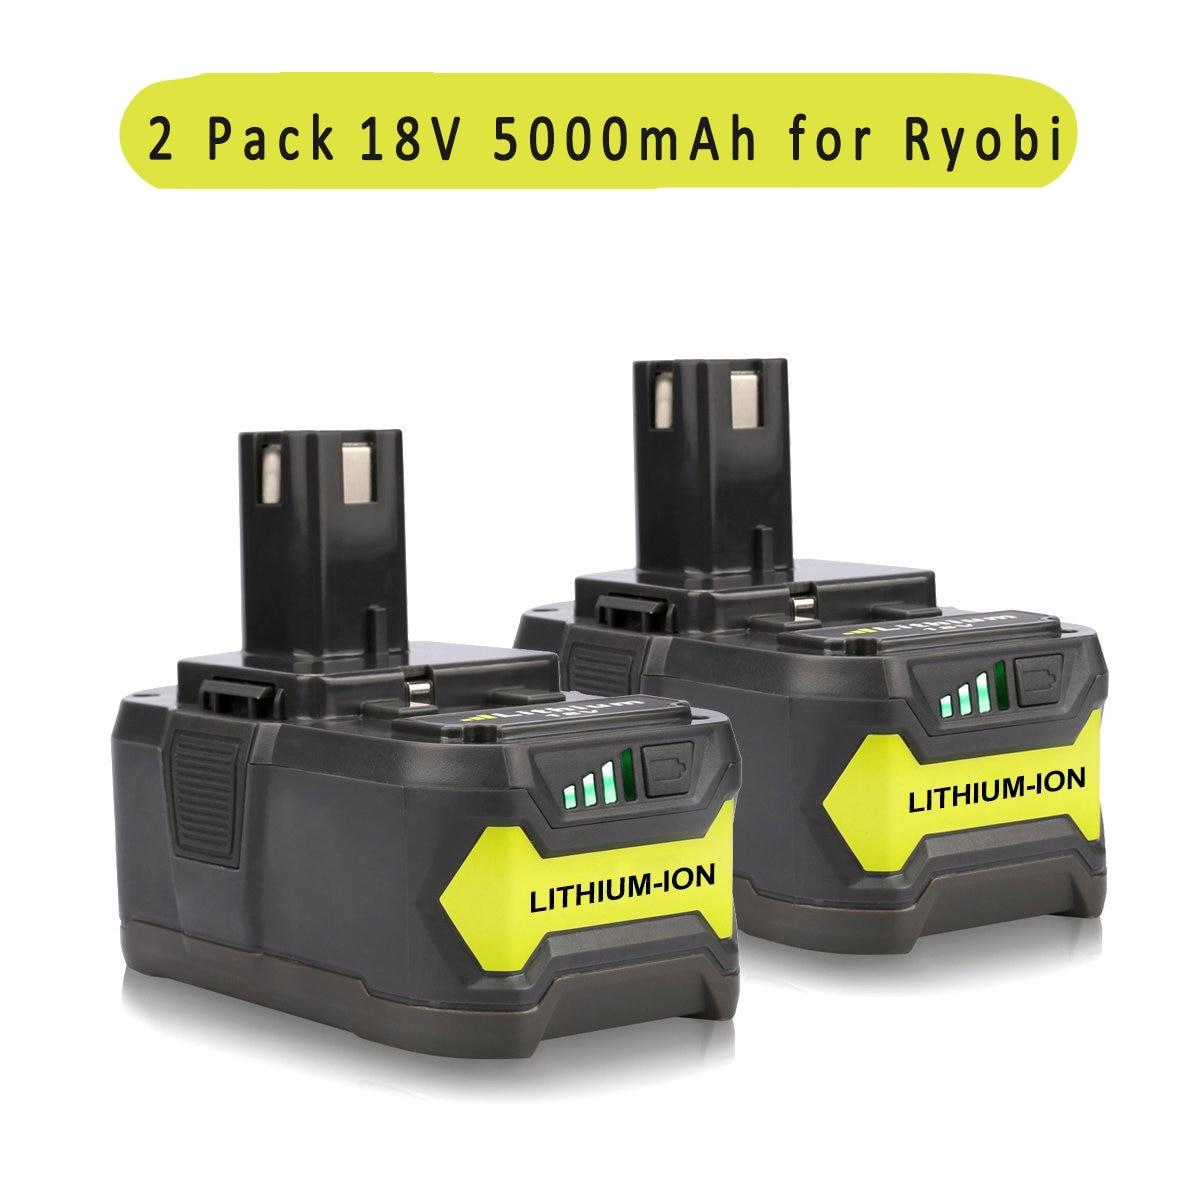 2 шт. новая Замена 18 в 5000 мАч литиевая батарея для электроинструмента Ryobi 18 вольтовый инструмент P122 P102 P108 P109|tools battery|battery replacementbattery for ryobi | АлиЭкспресс